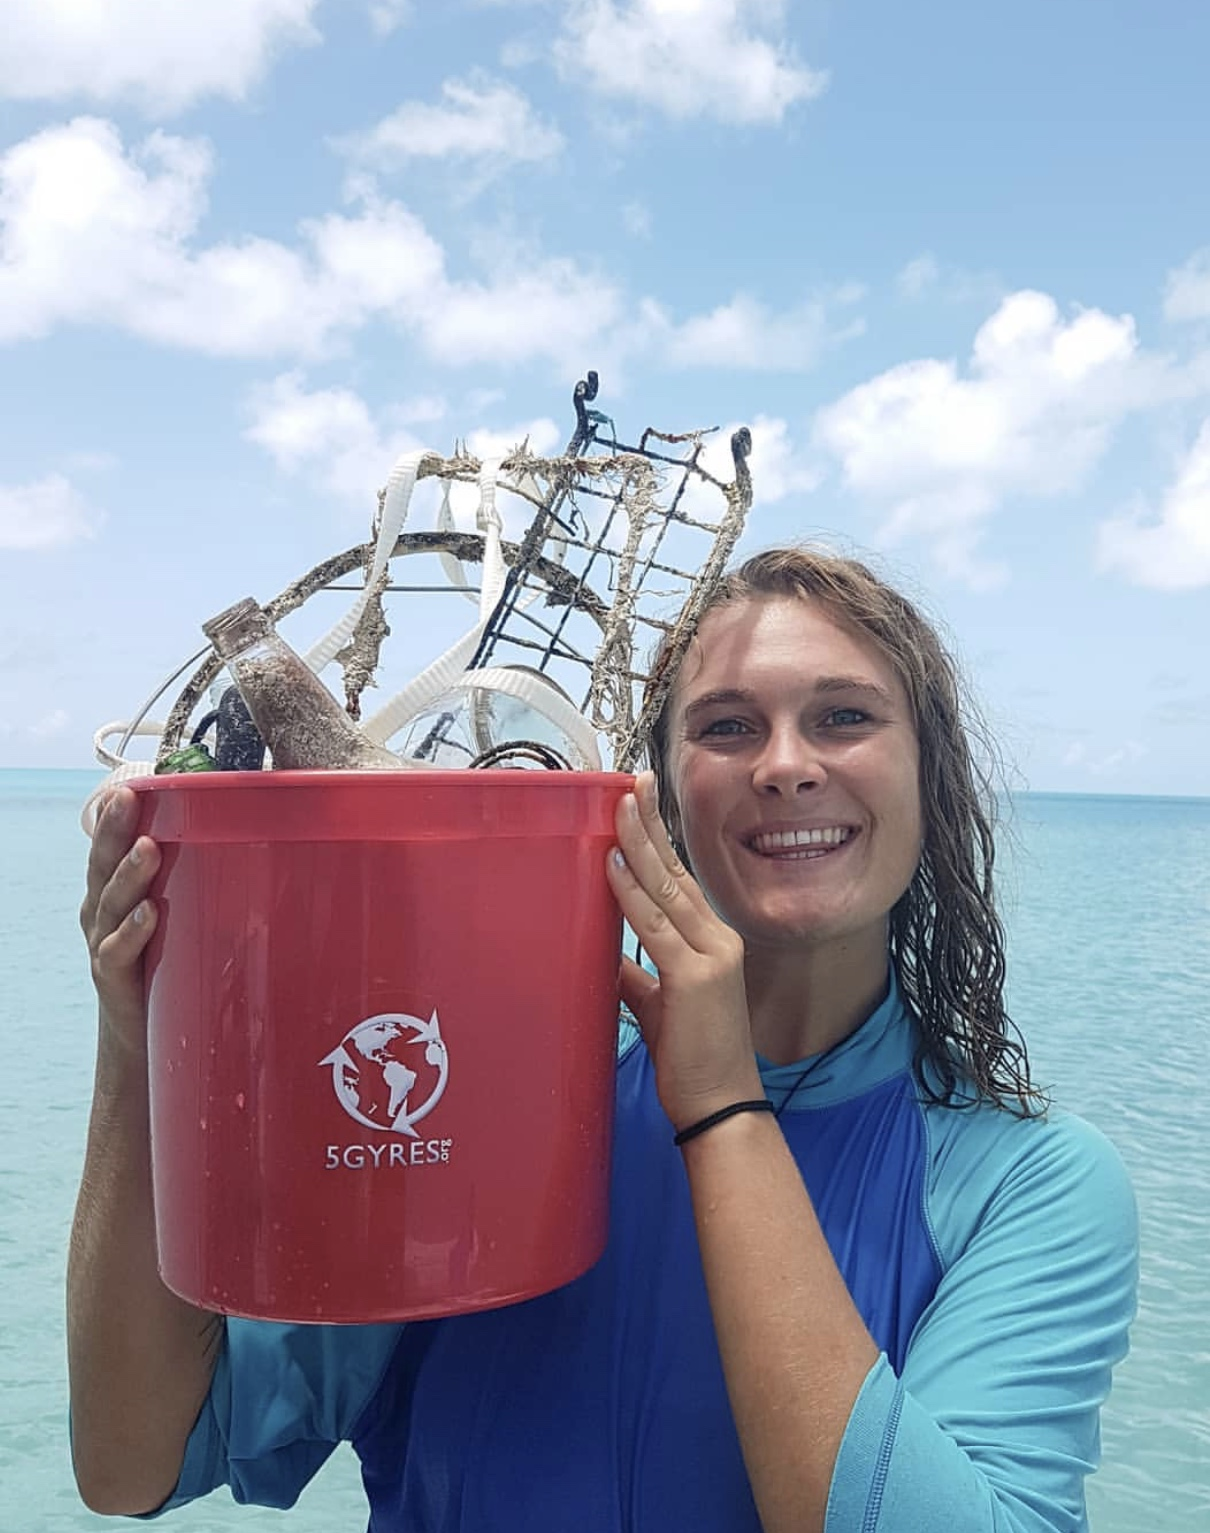 Vevolution Festival 2016 volunteer Pyla Lara on a beach clean up in Bermuda